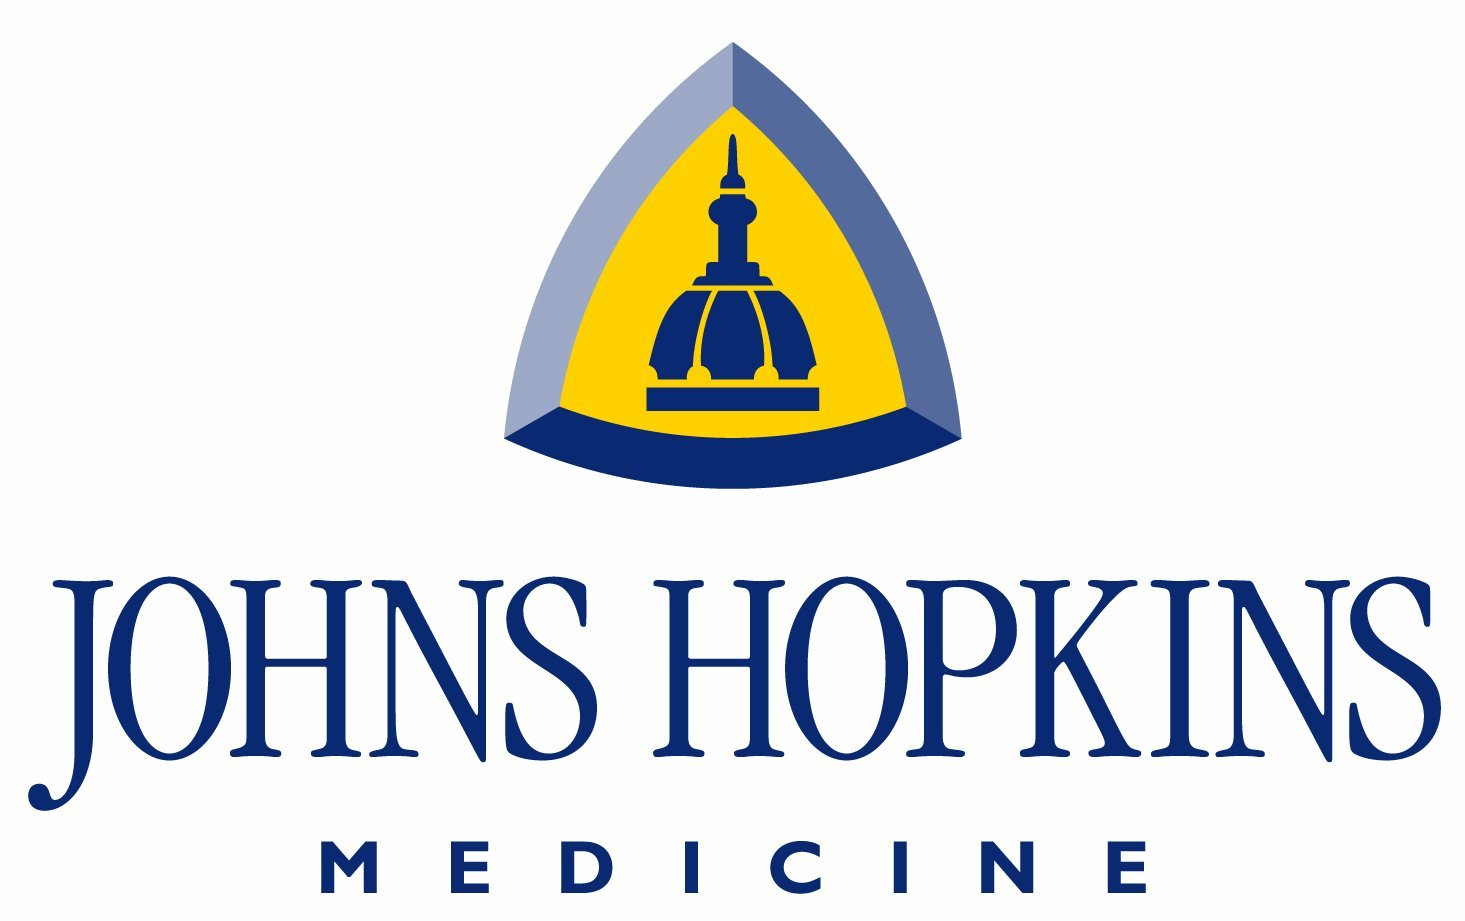 Johns hopkins dating